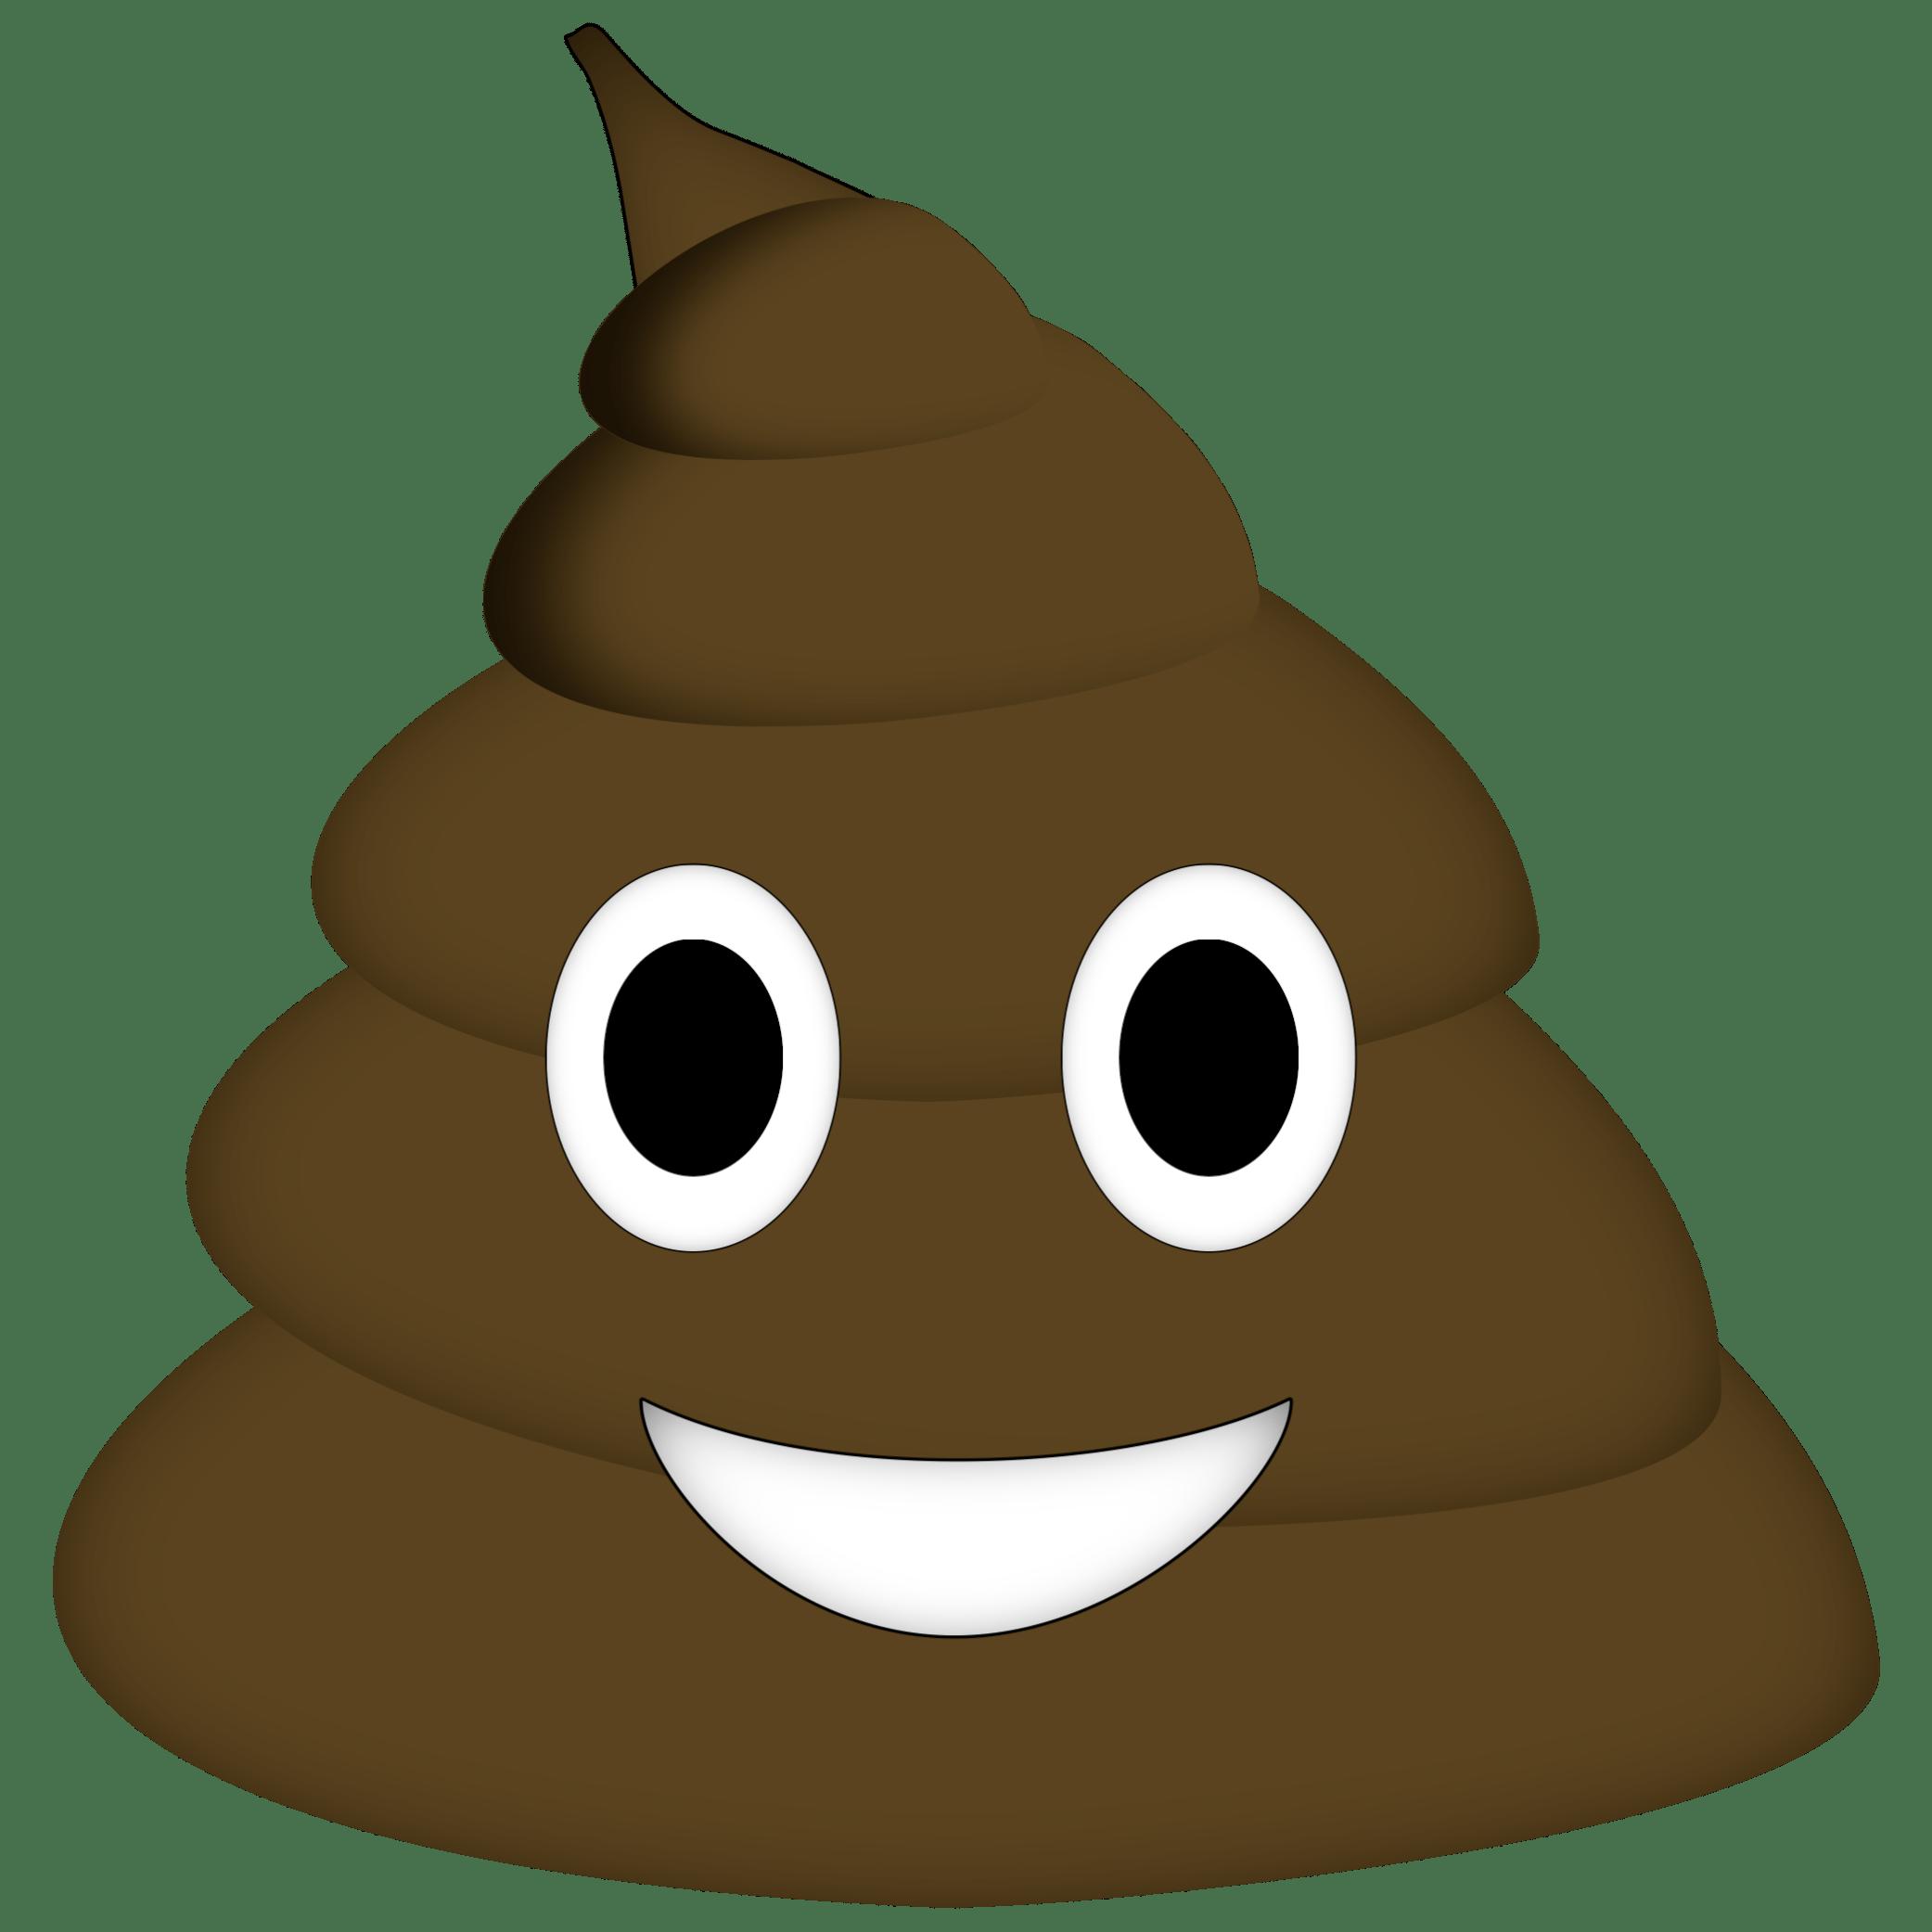 Money emoji clipart transparent download Emoji Faces Printable {Free Emoji Printables} - Paper Trail Design transparent download